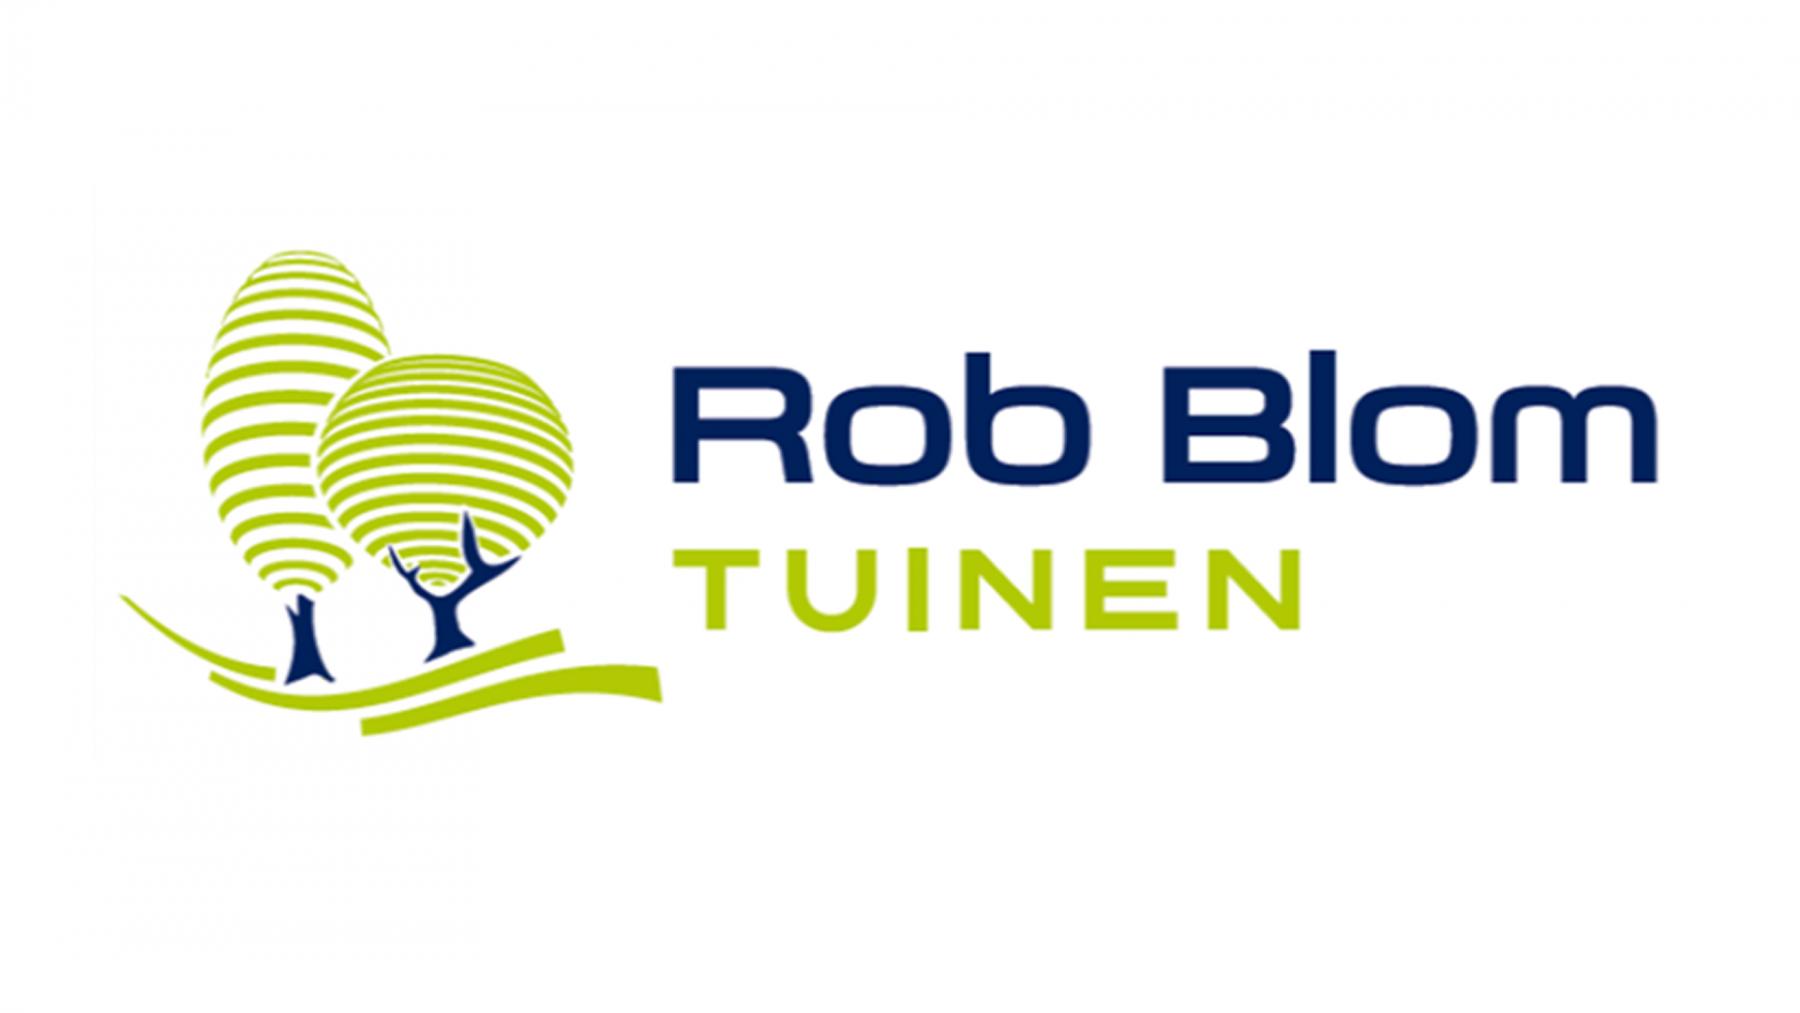 Rob-Blom-Tuinen.fw_